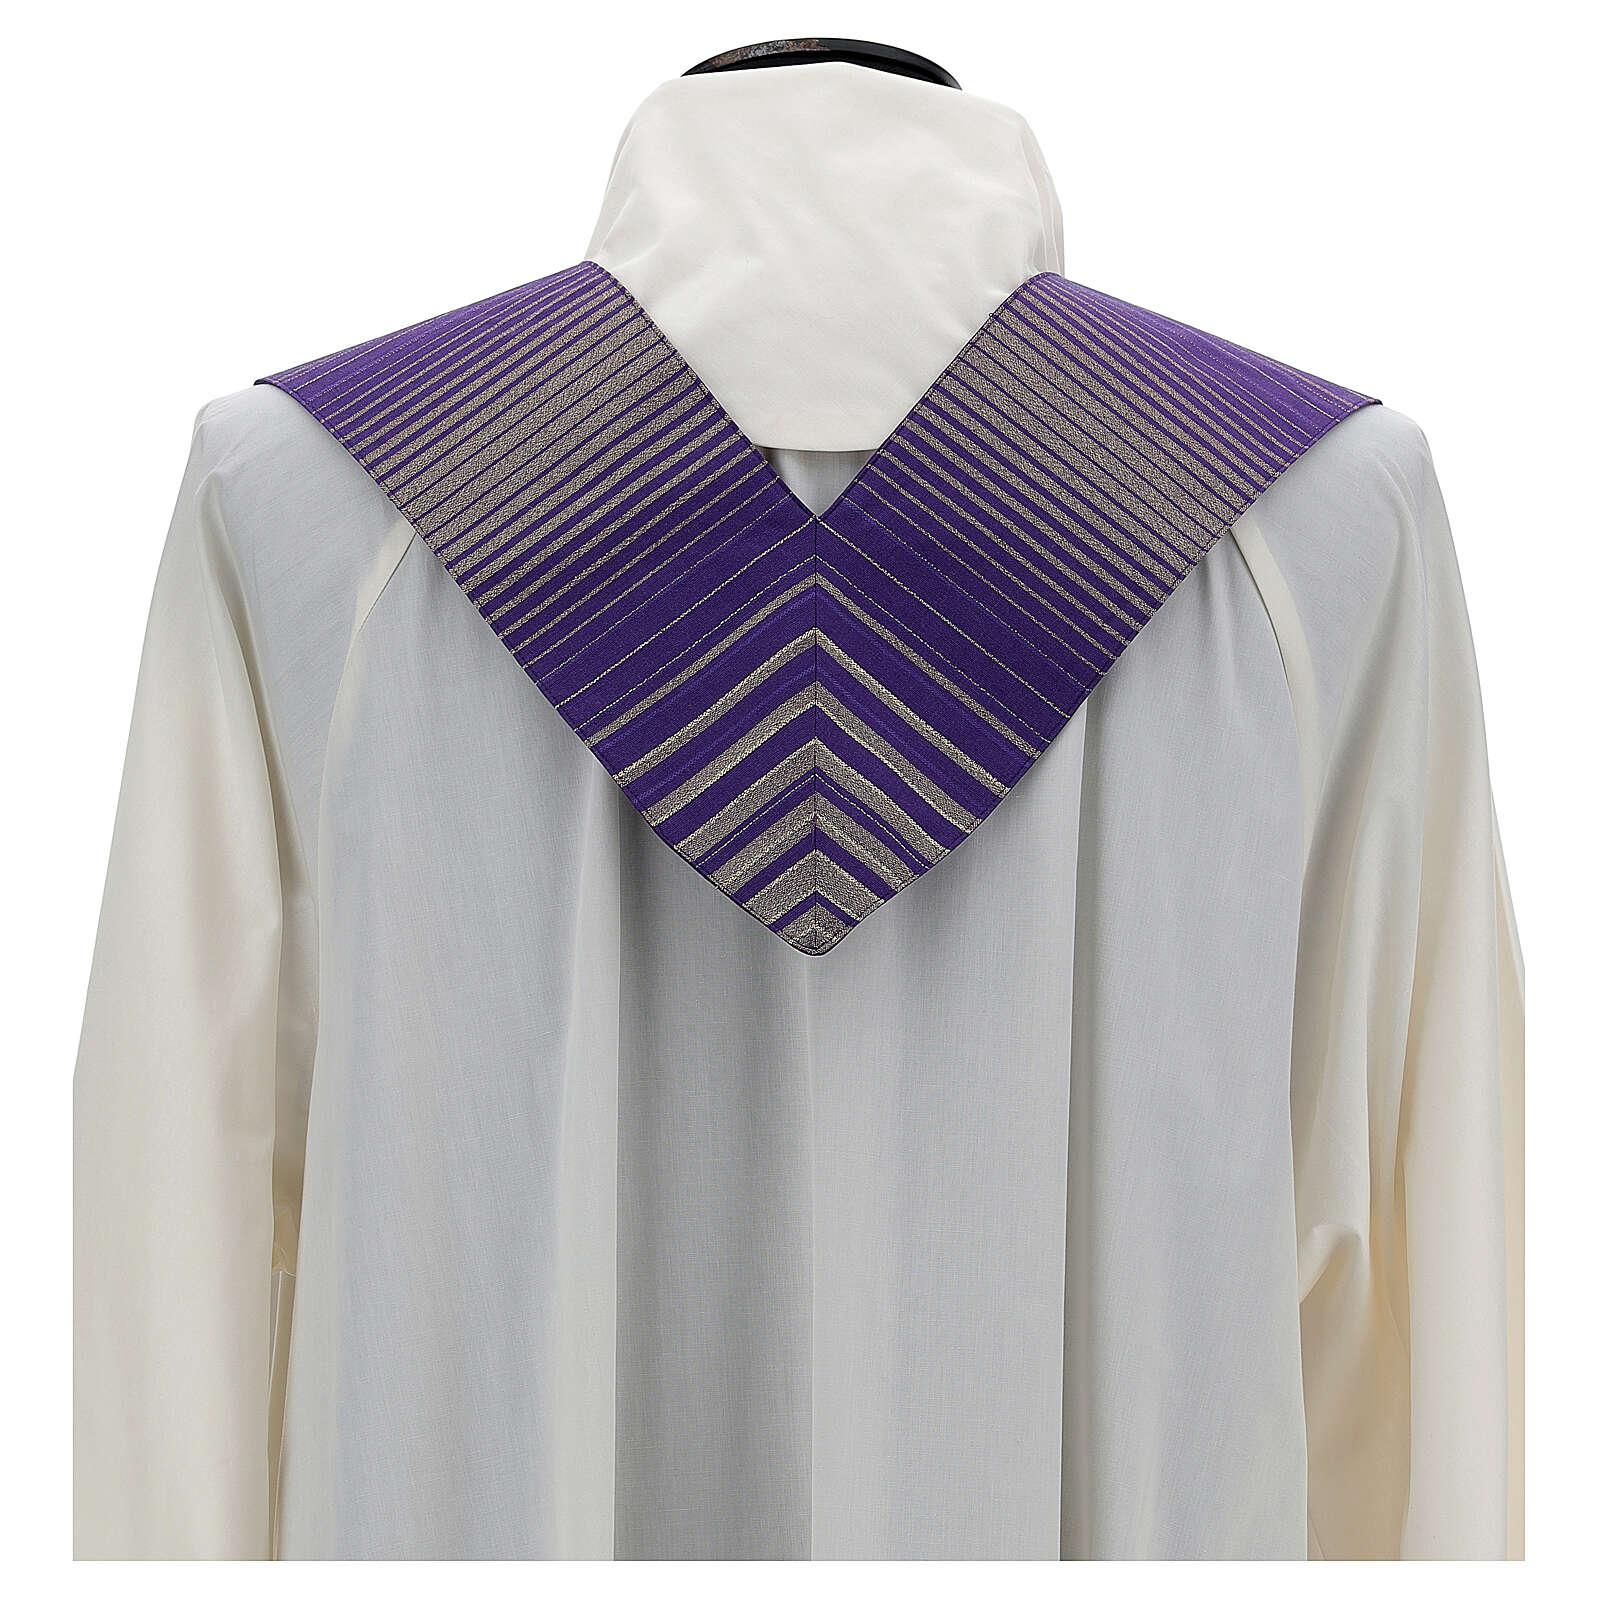 Estola rayada lana lurex cruz bordada con máquina 4